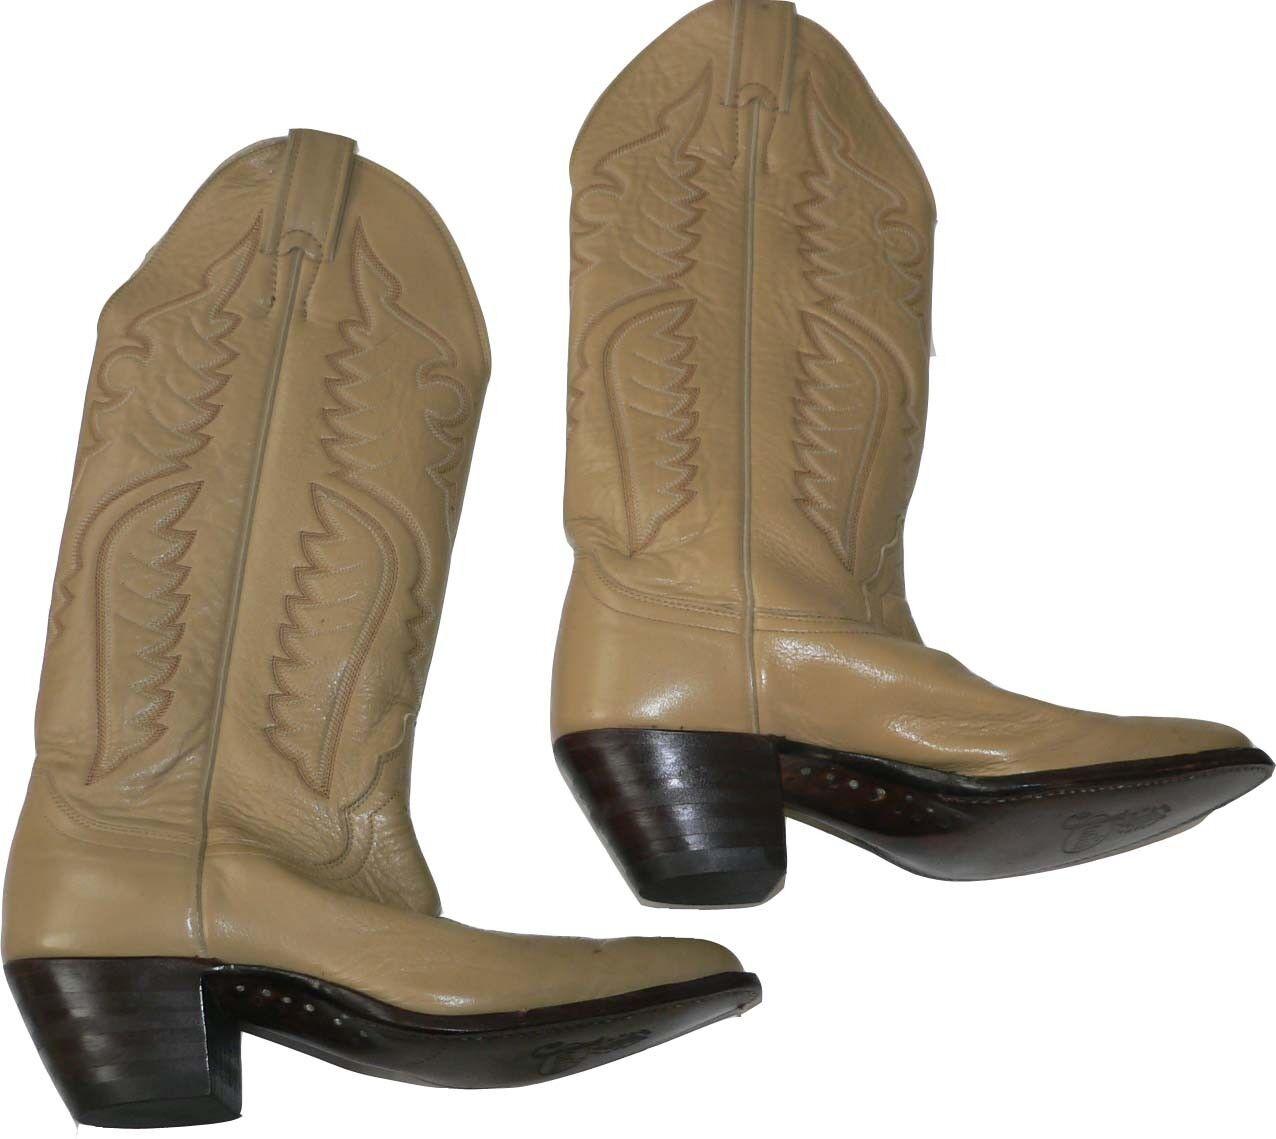 NEW Vintage JUSTIN Cowboy Cowboy Cowboy Western Boots bone Womens 5.5 A Narrow ladies tan c439fb